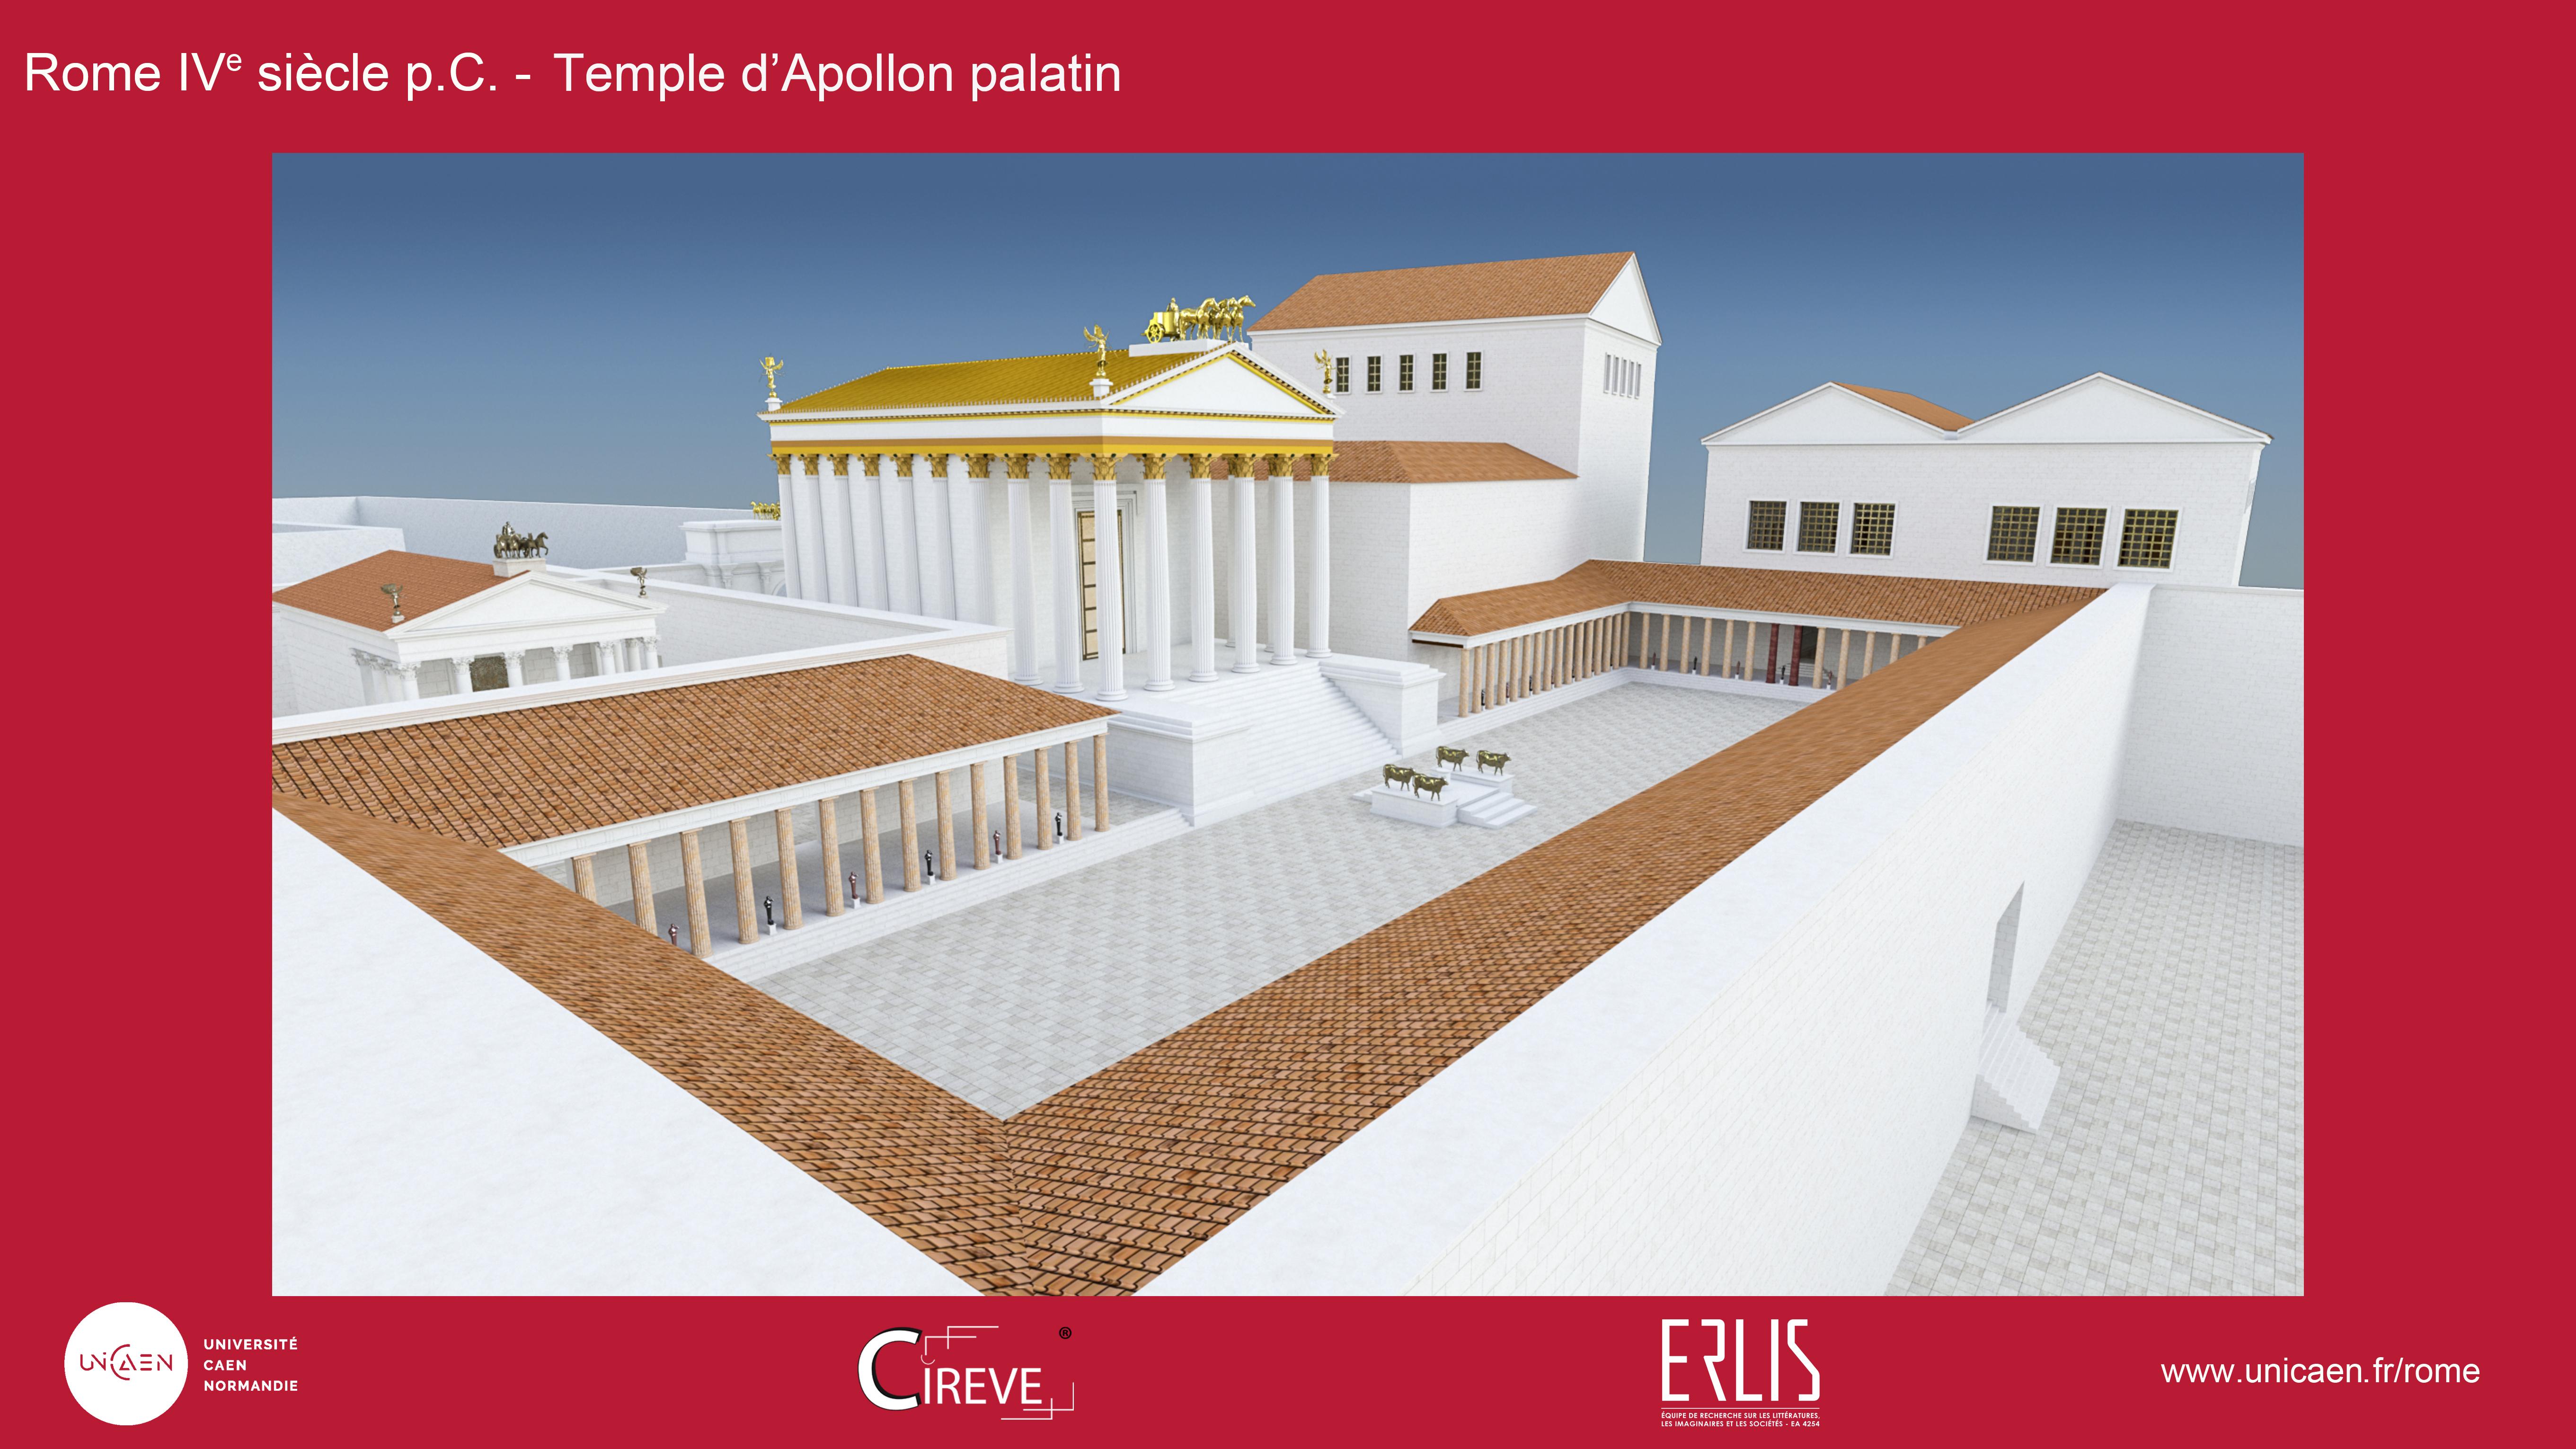 Temple d'Apollon palatin